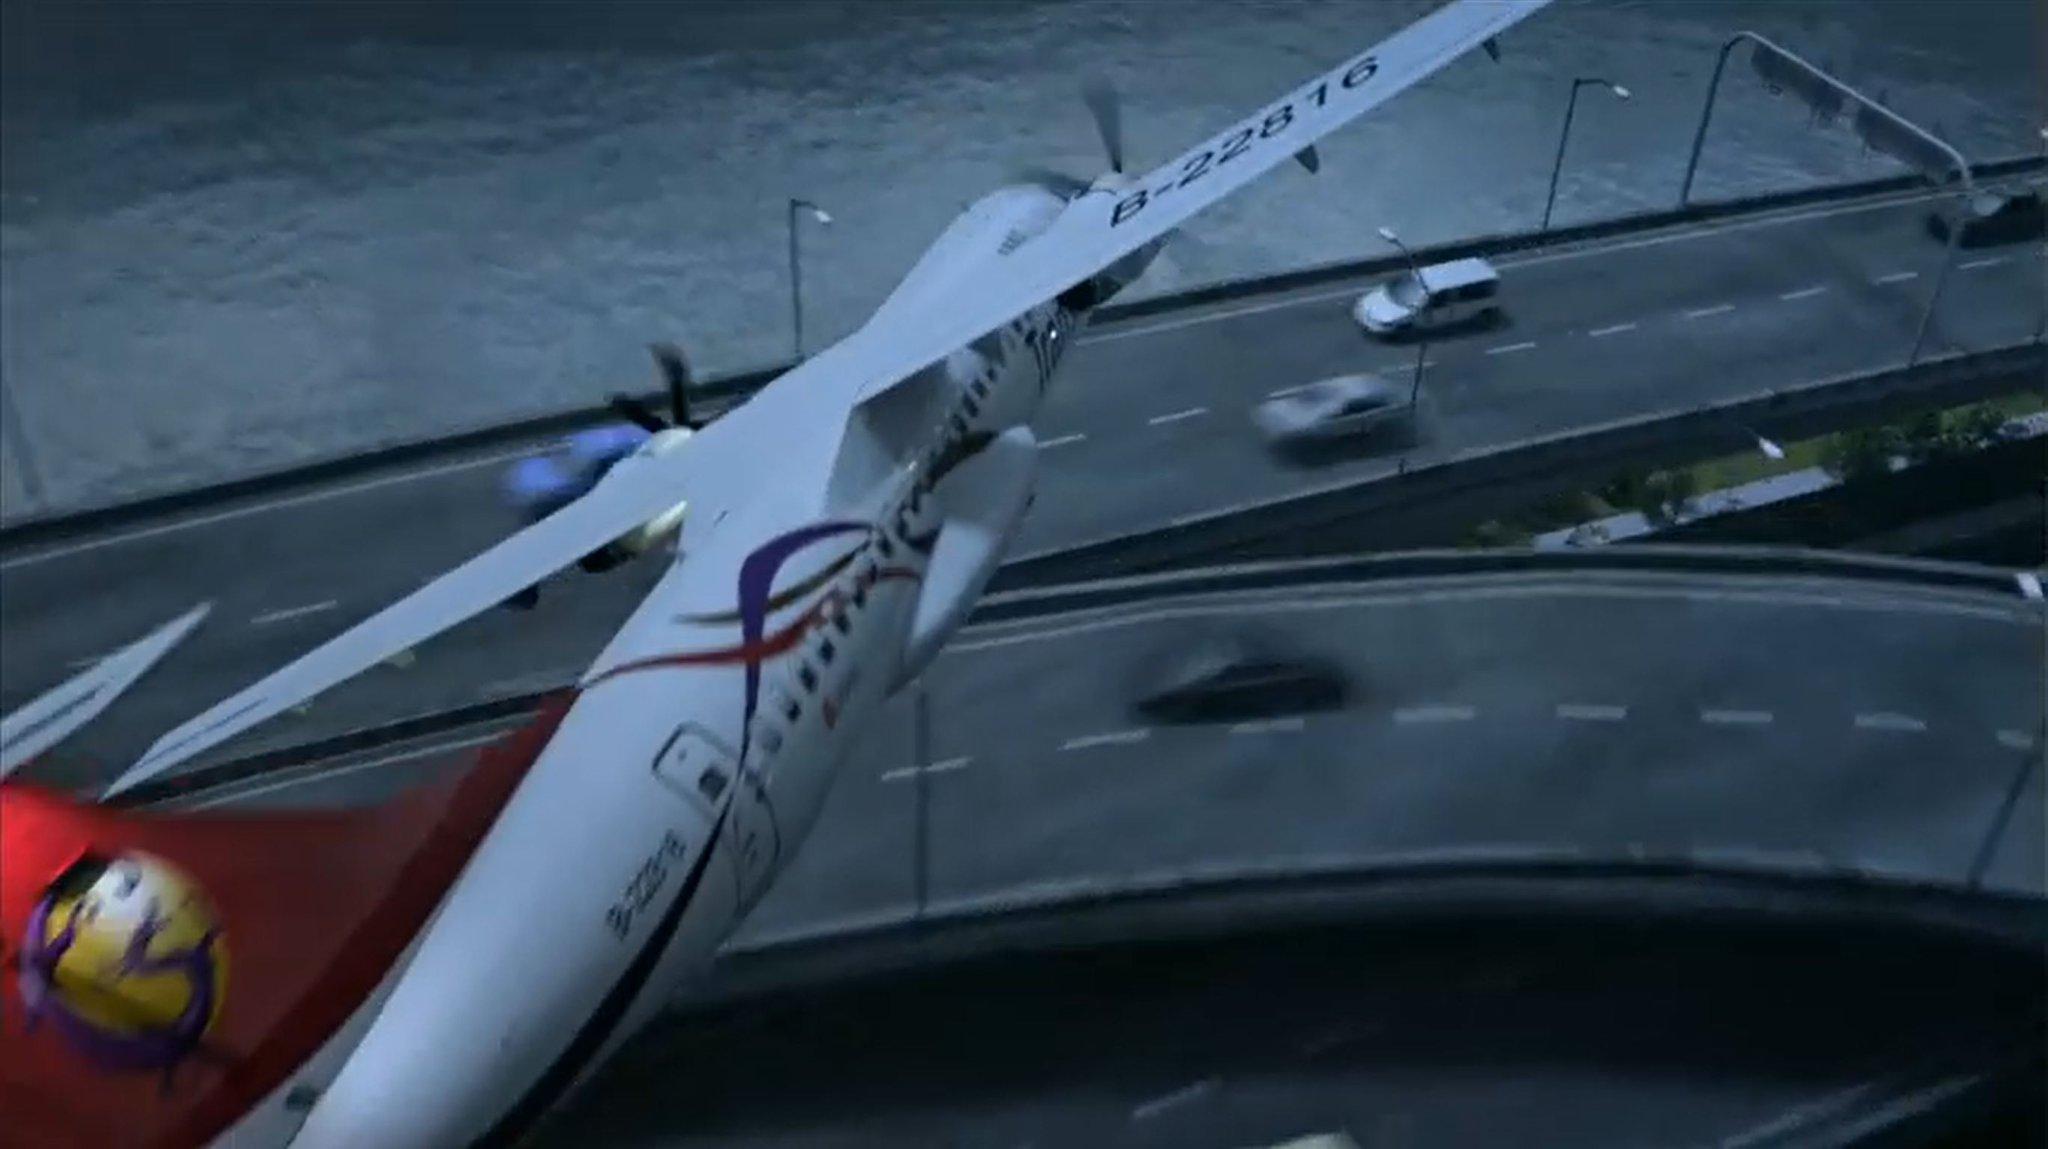 Air crash investigation season 17 dailymotion